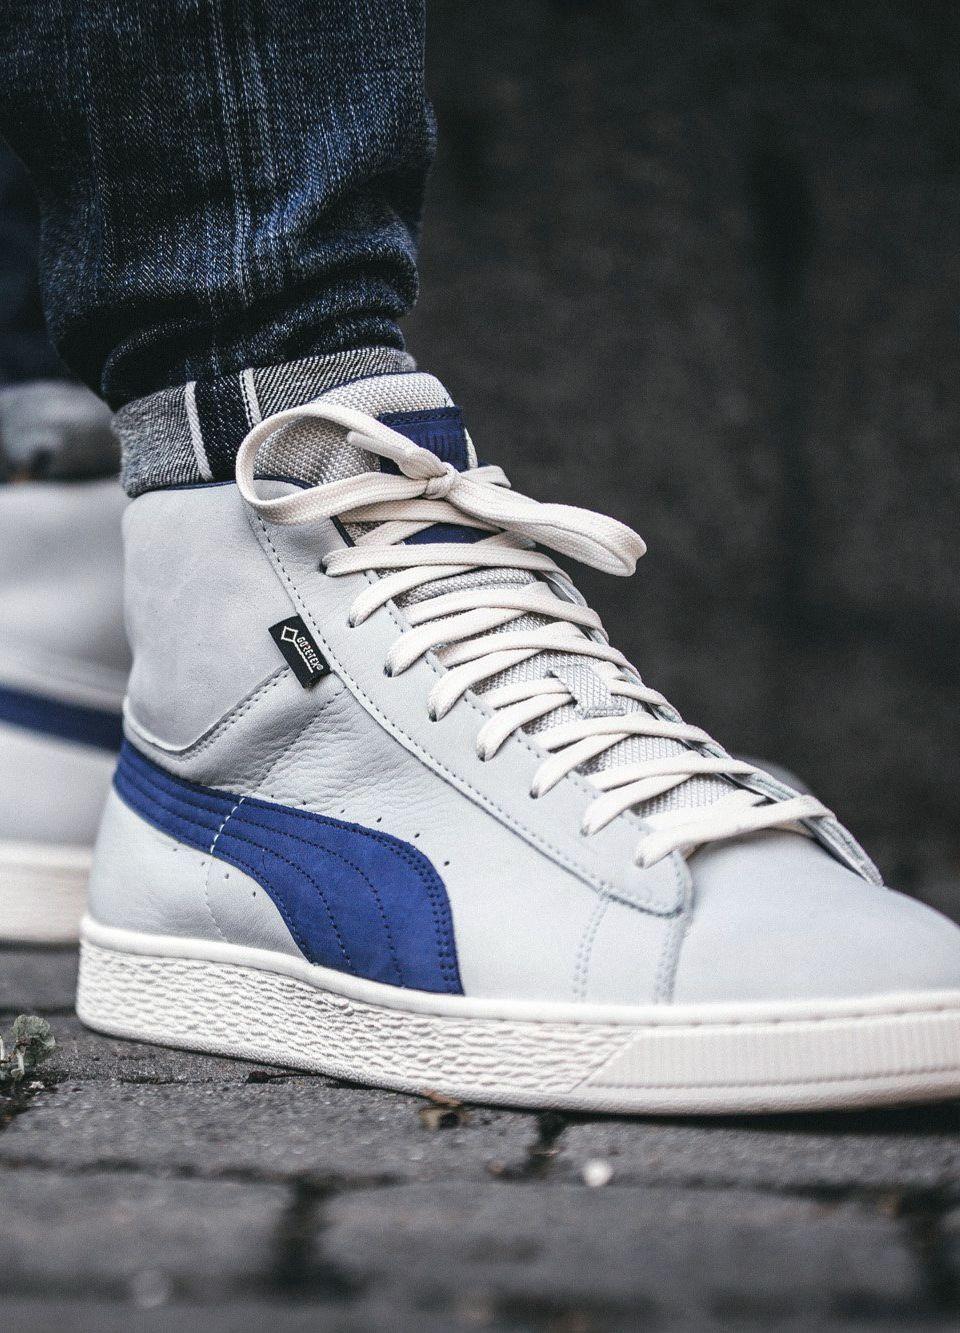 timeless design 8c8df 31c22 Puma Basket Mid 'Gore-Tex' 'grey / blue' (via Kicks-daily ...